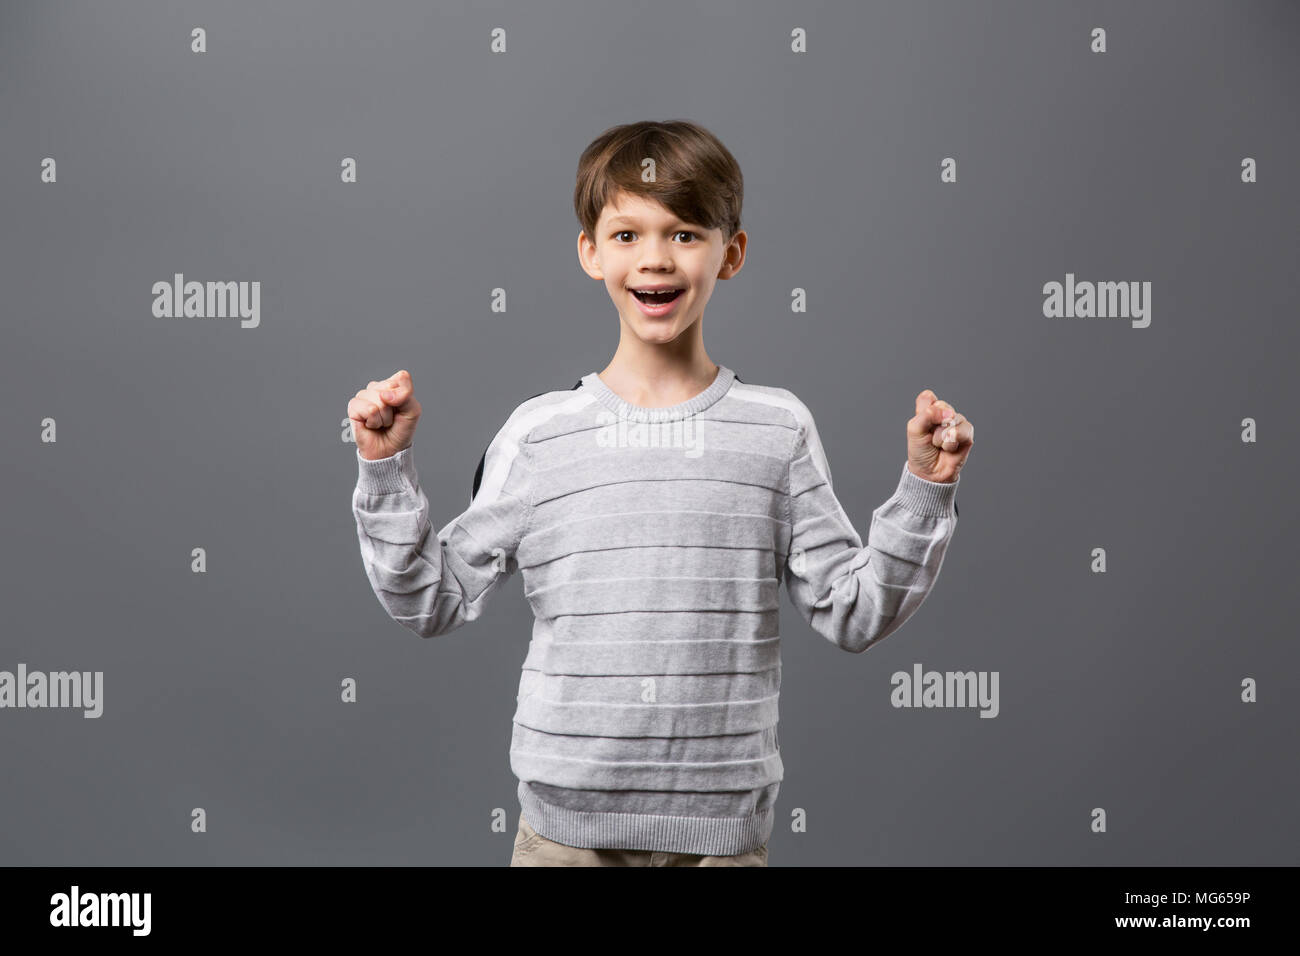 Pleasant joyful boy expressing his happiness - Stock Image